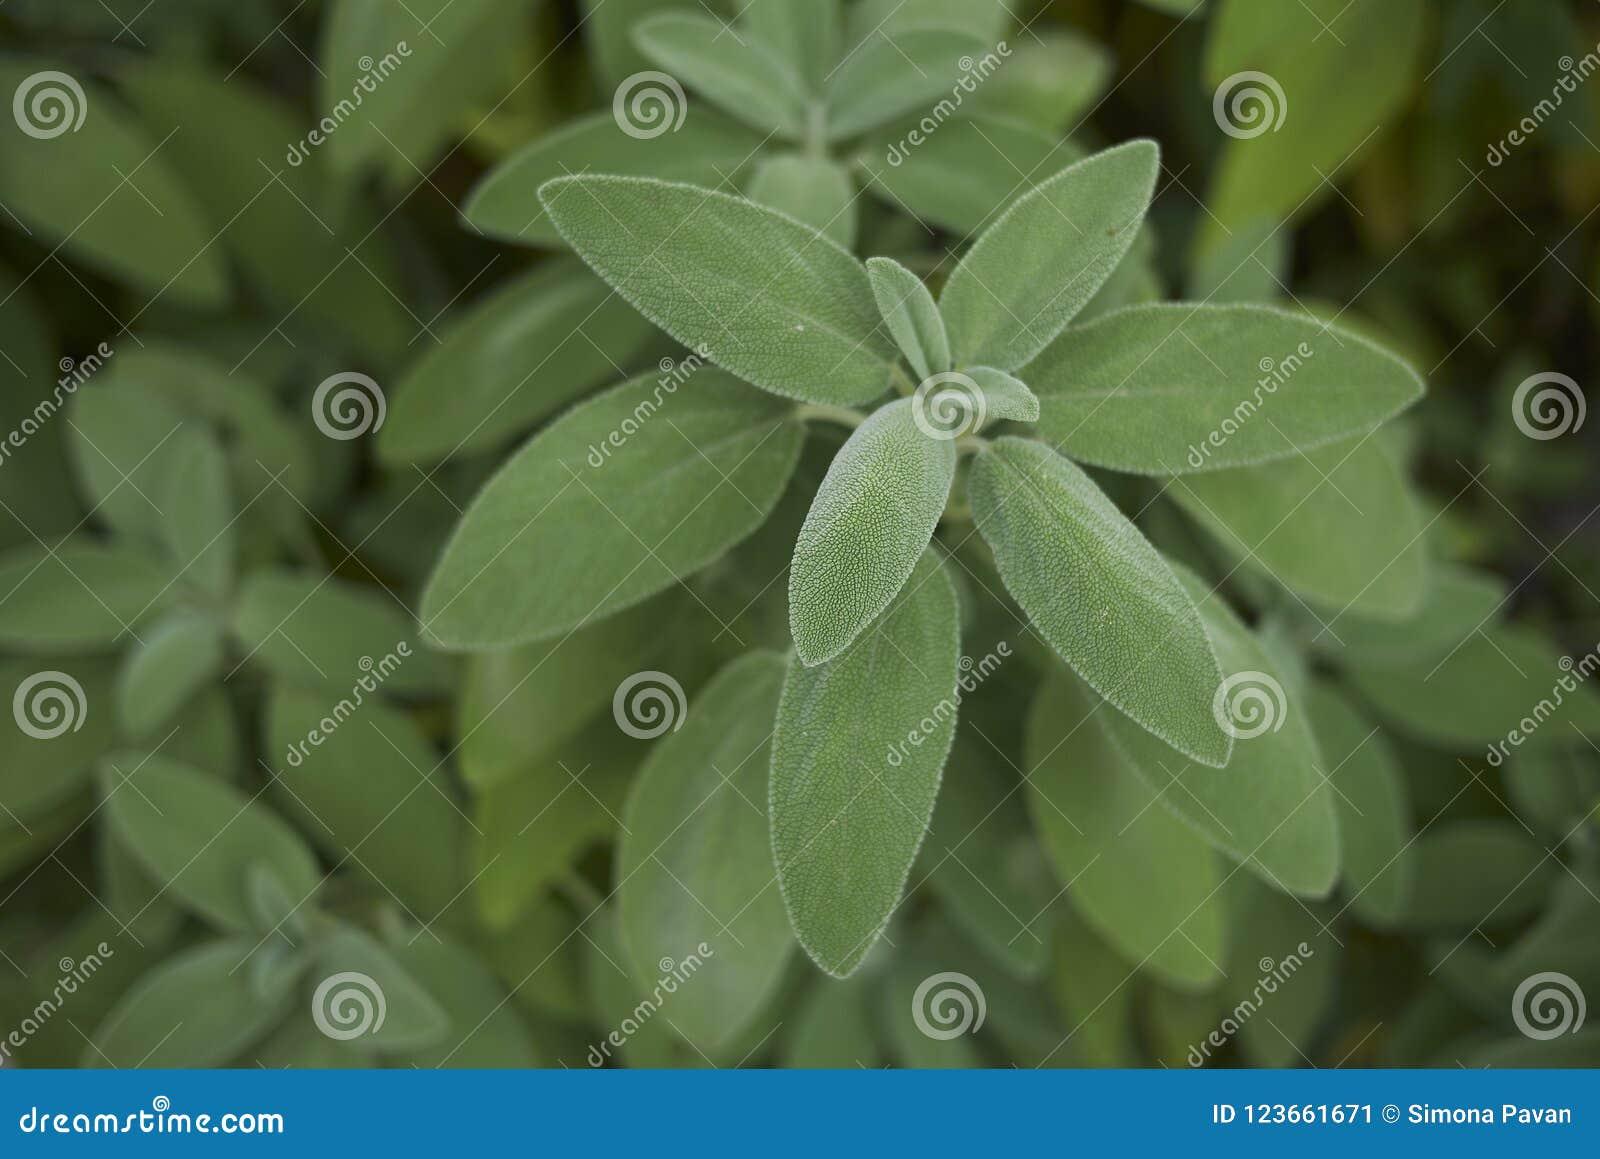 Salvia officinalis plants